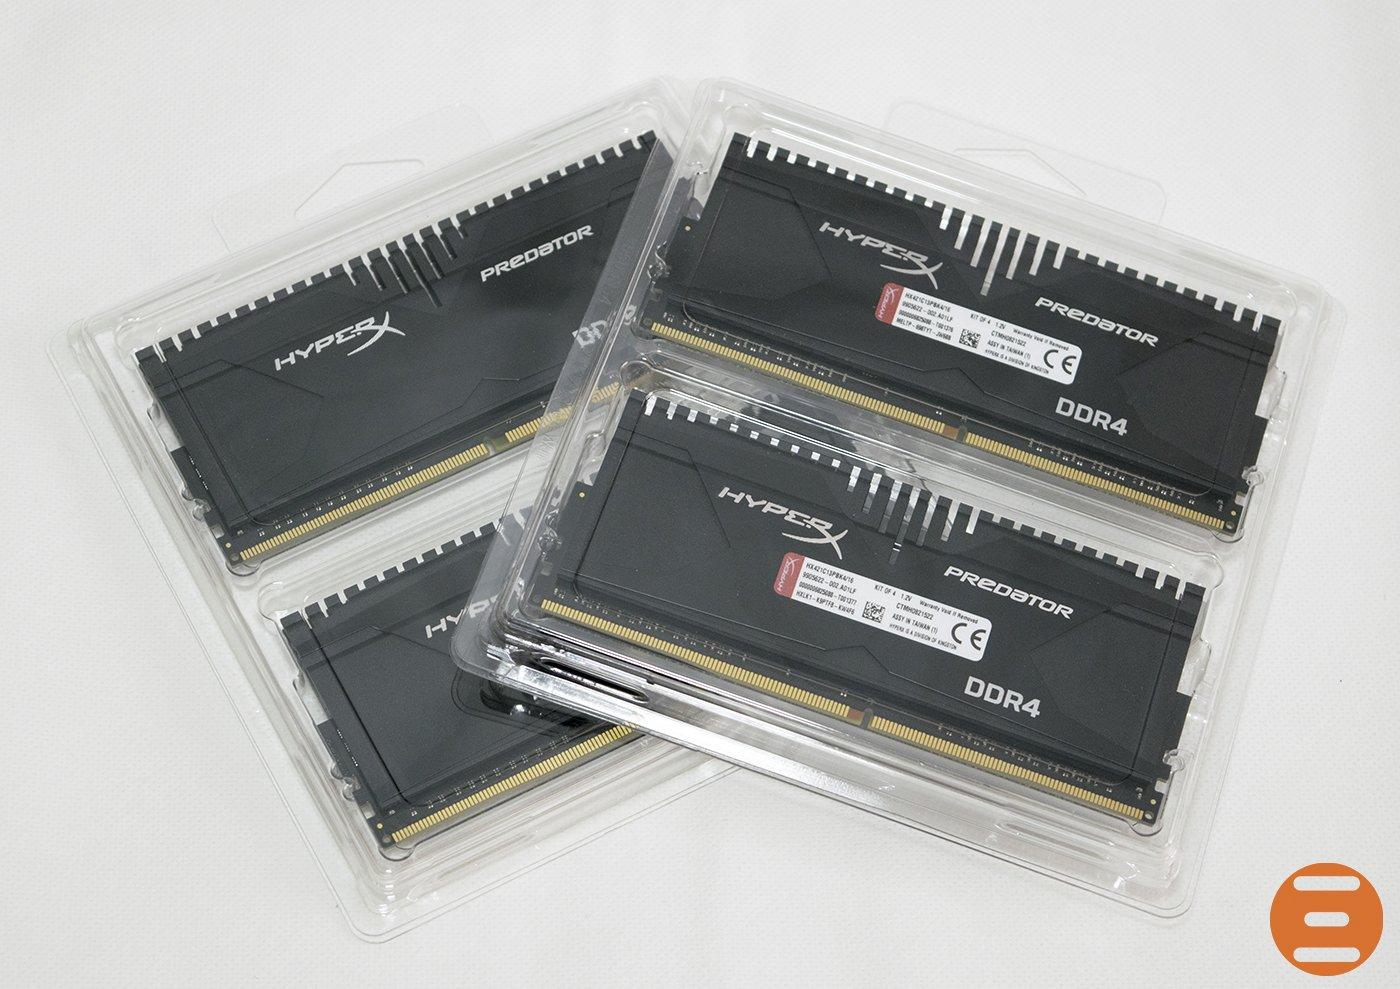 HyperX Predator 2133MHz DDR4 1